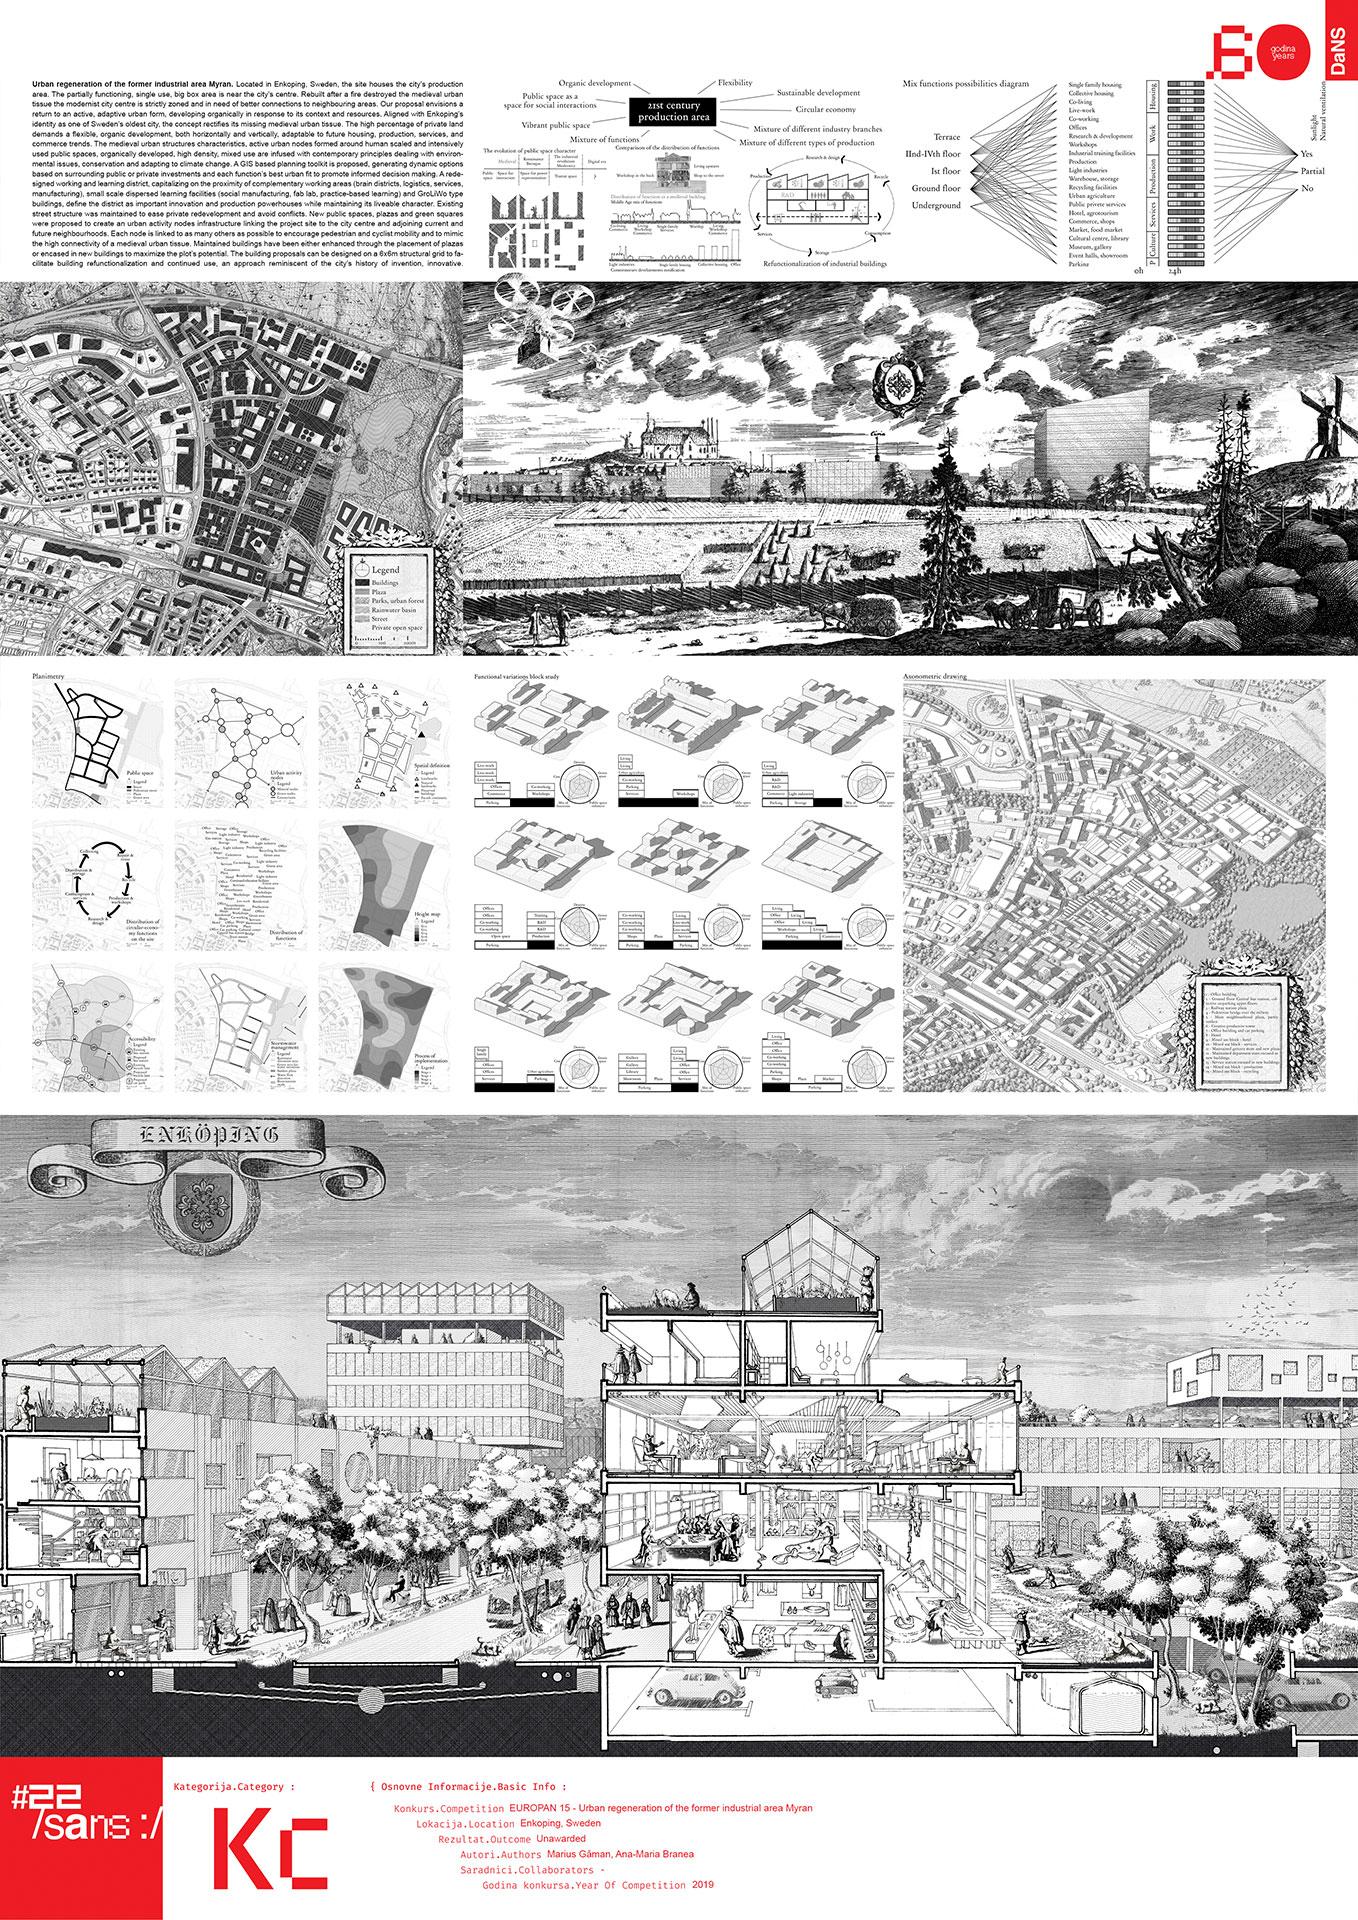 "<p class=""naslov-br"">kc10</p>Dani prošle budućnosti - urbana regeneracija bivše industrijske zone Myran, u Enkopingu, Švedska // Days of future past - urban regeneration of the former industrial area Myran, in Enkoping, Sweden"